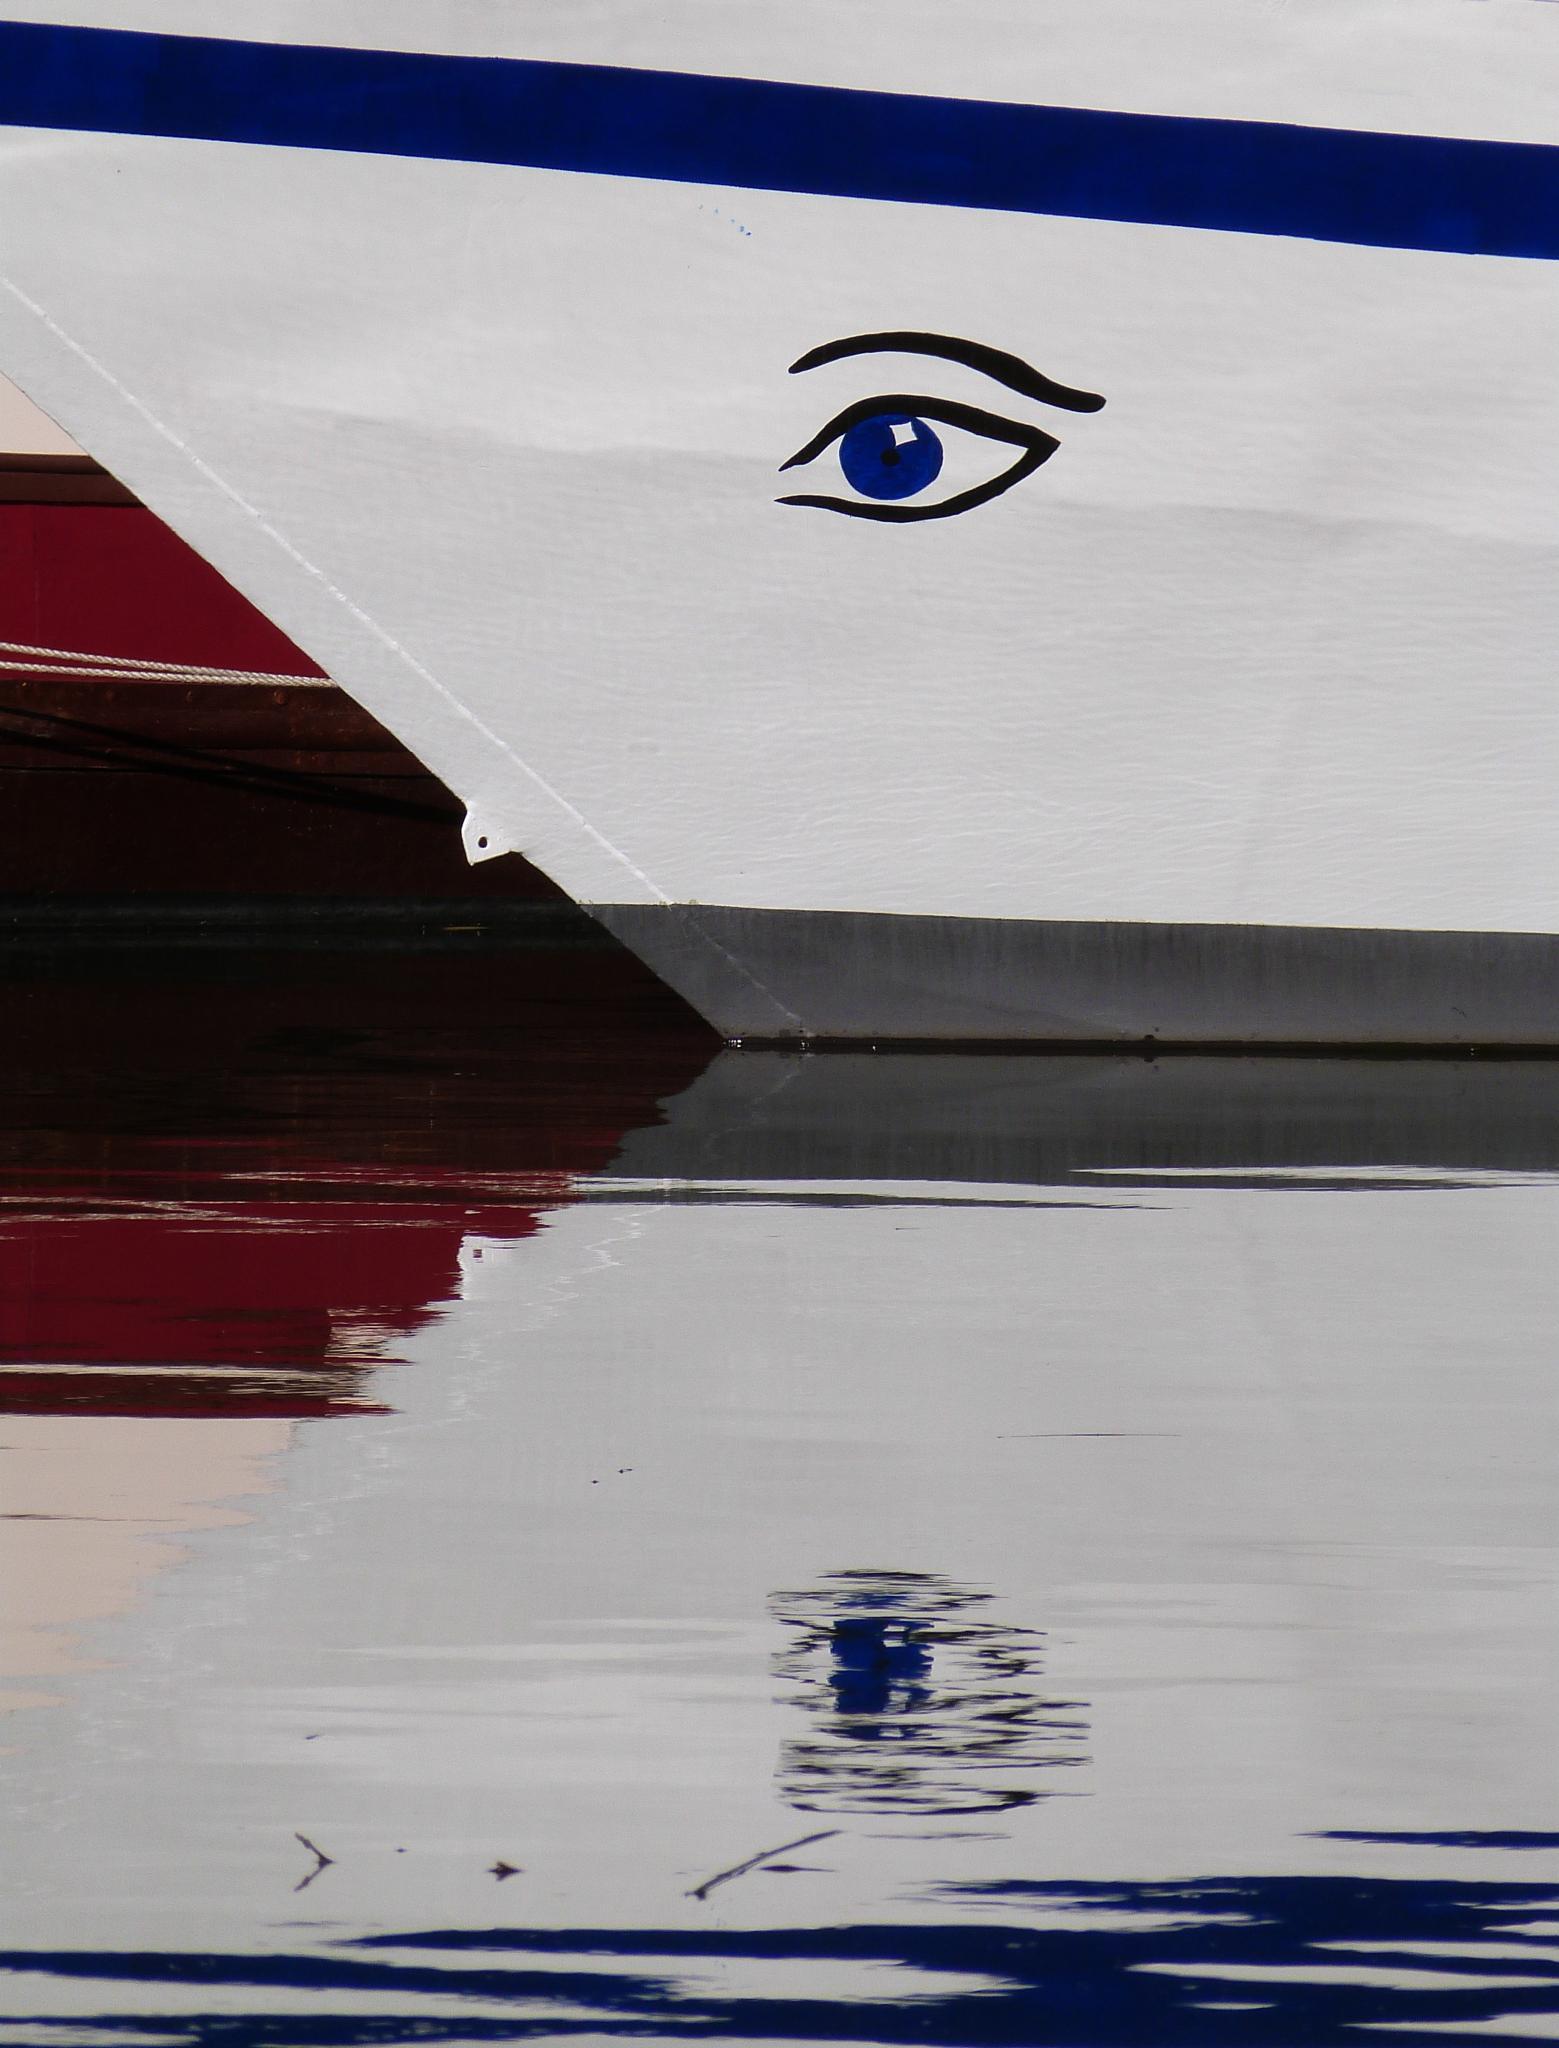 Eye on you by florenceguichard73